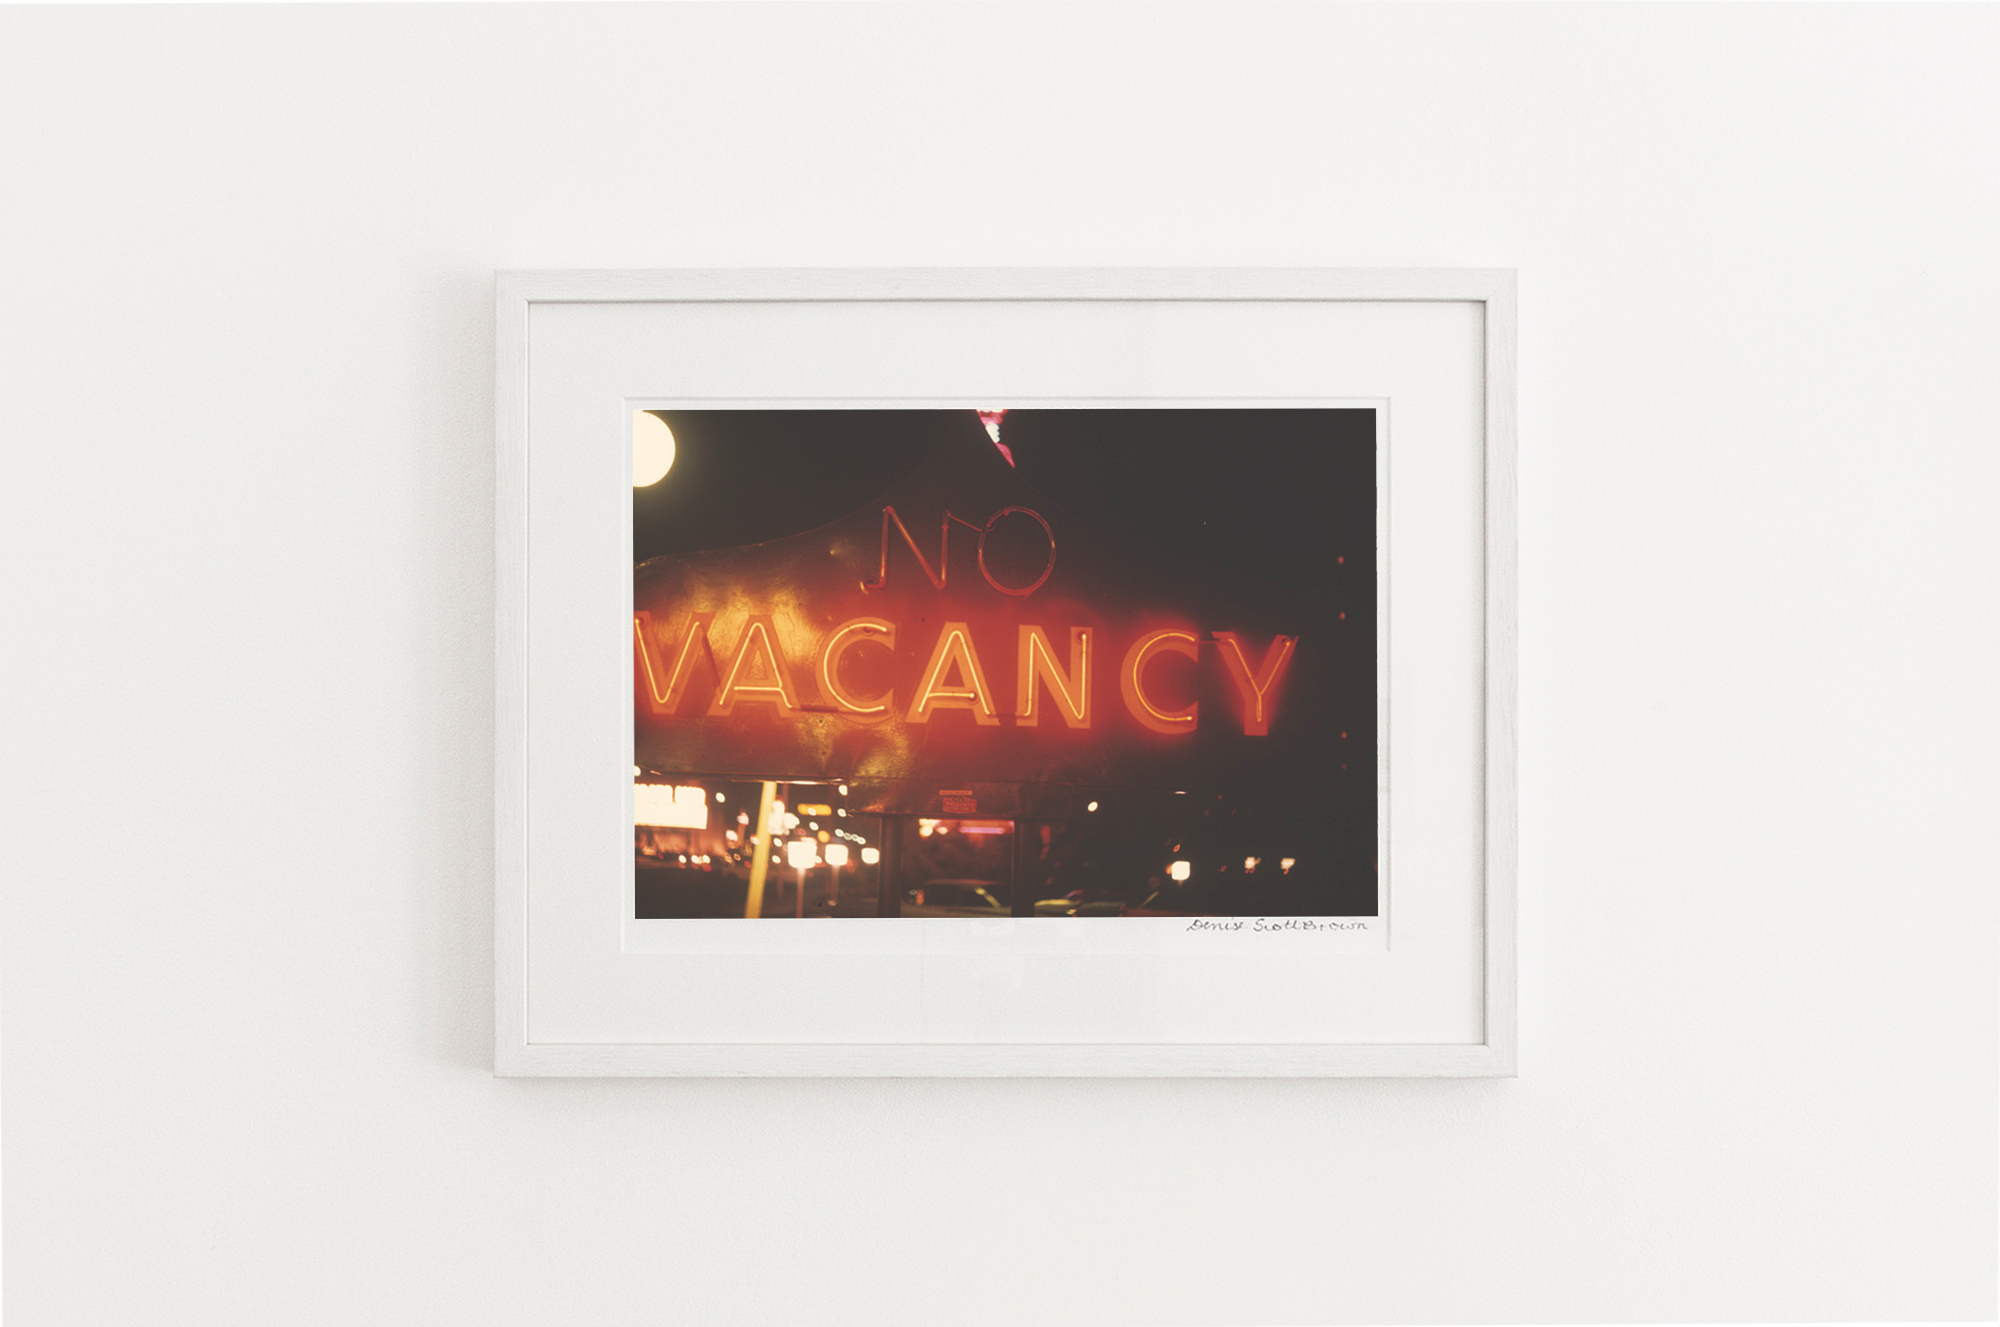 (No) Vacancy, Las Vegas , 1966. Giclée pigment on Hahnemuhle archivalpaper, 45.5 x 30.3 cm (framed), Edition of 10